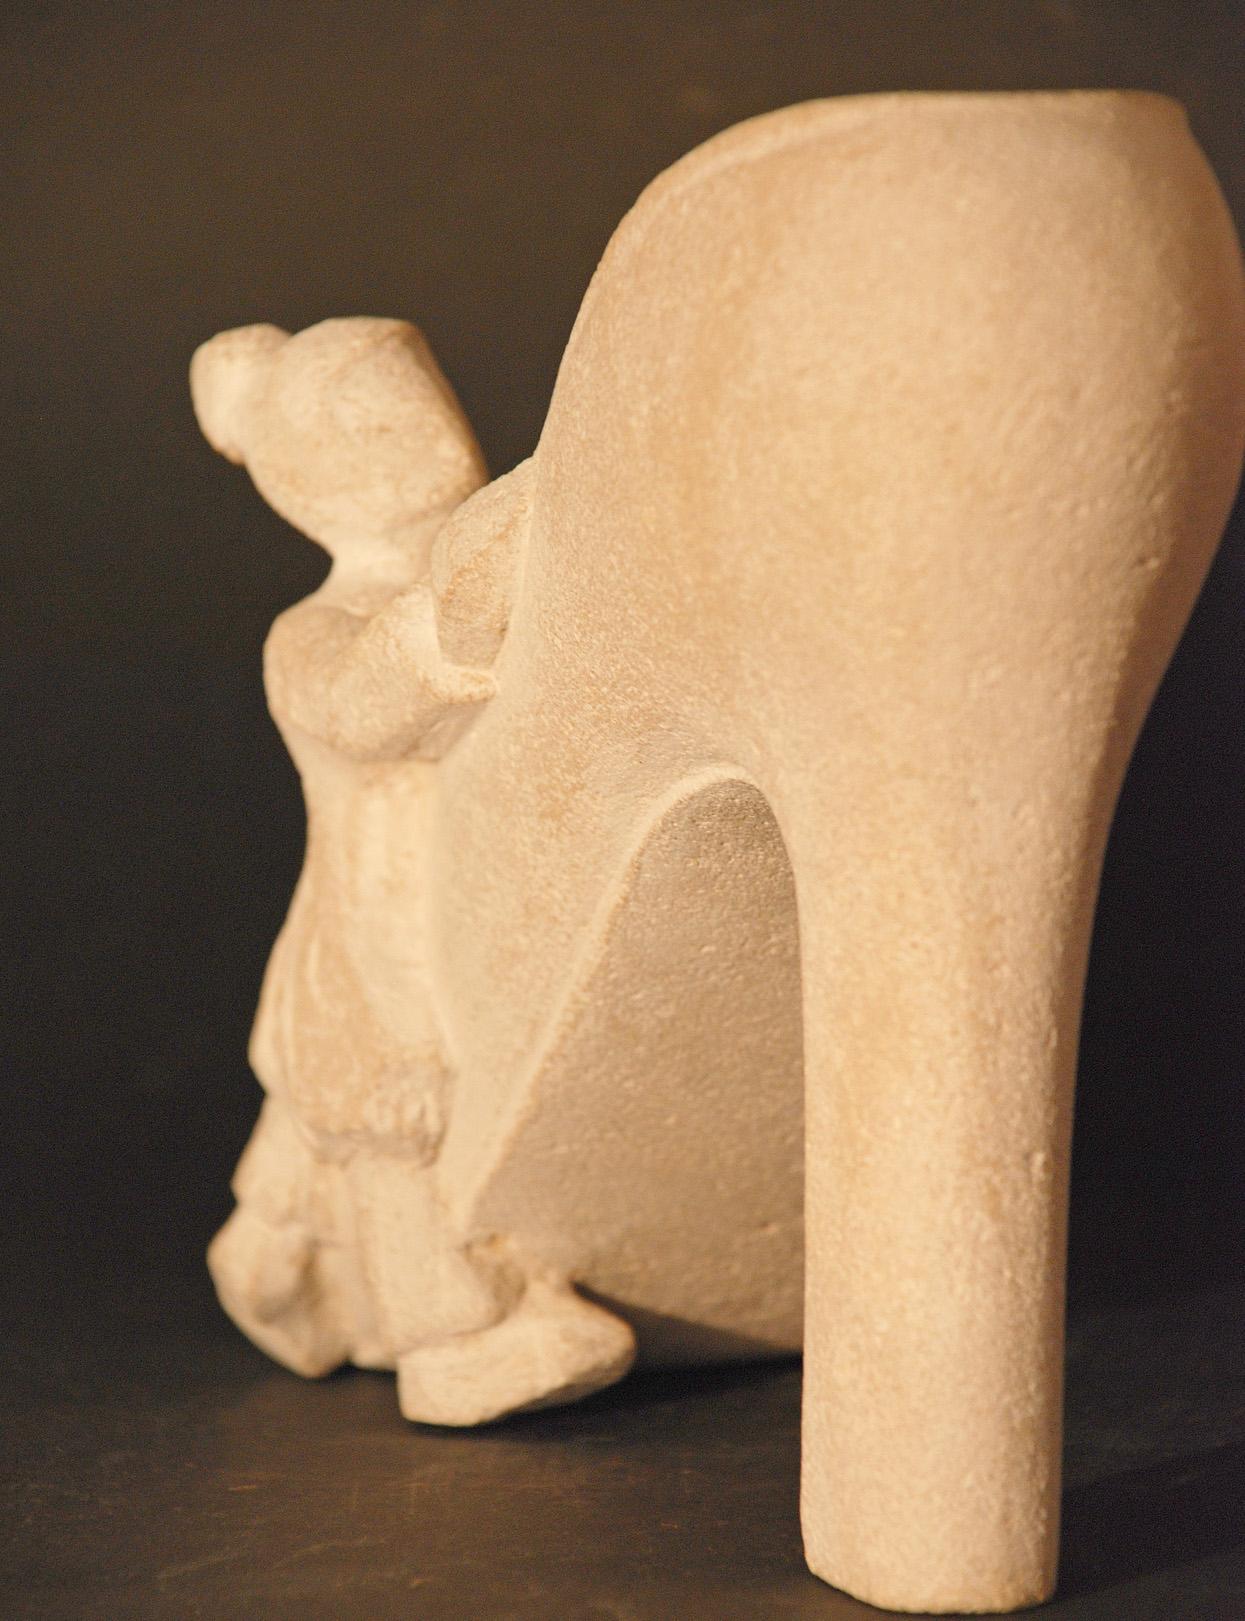 Gissinger Mariele – Sculpture – Bronzes – Modelage – Terre – Ton - Céramique – Porcelaine – Porcelain – Artiste - Art-gm – Alsace - France